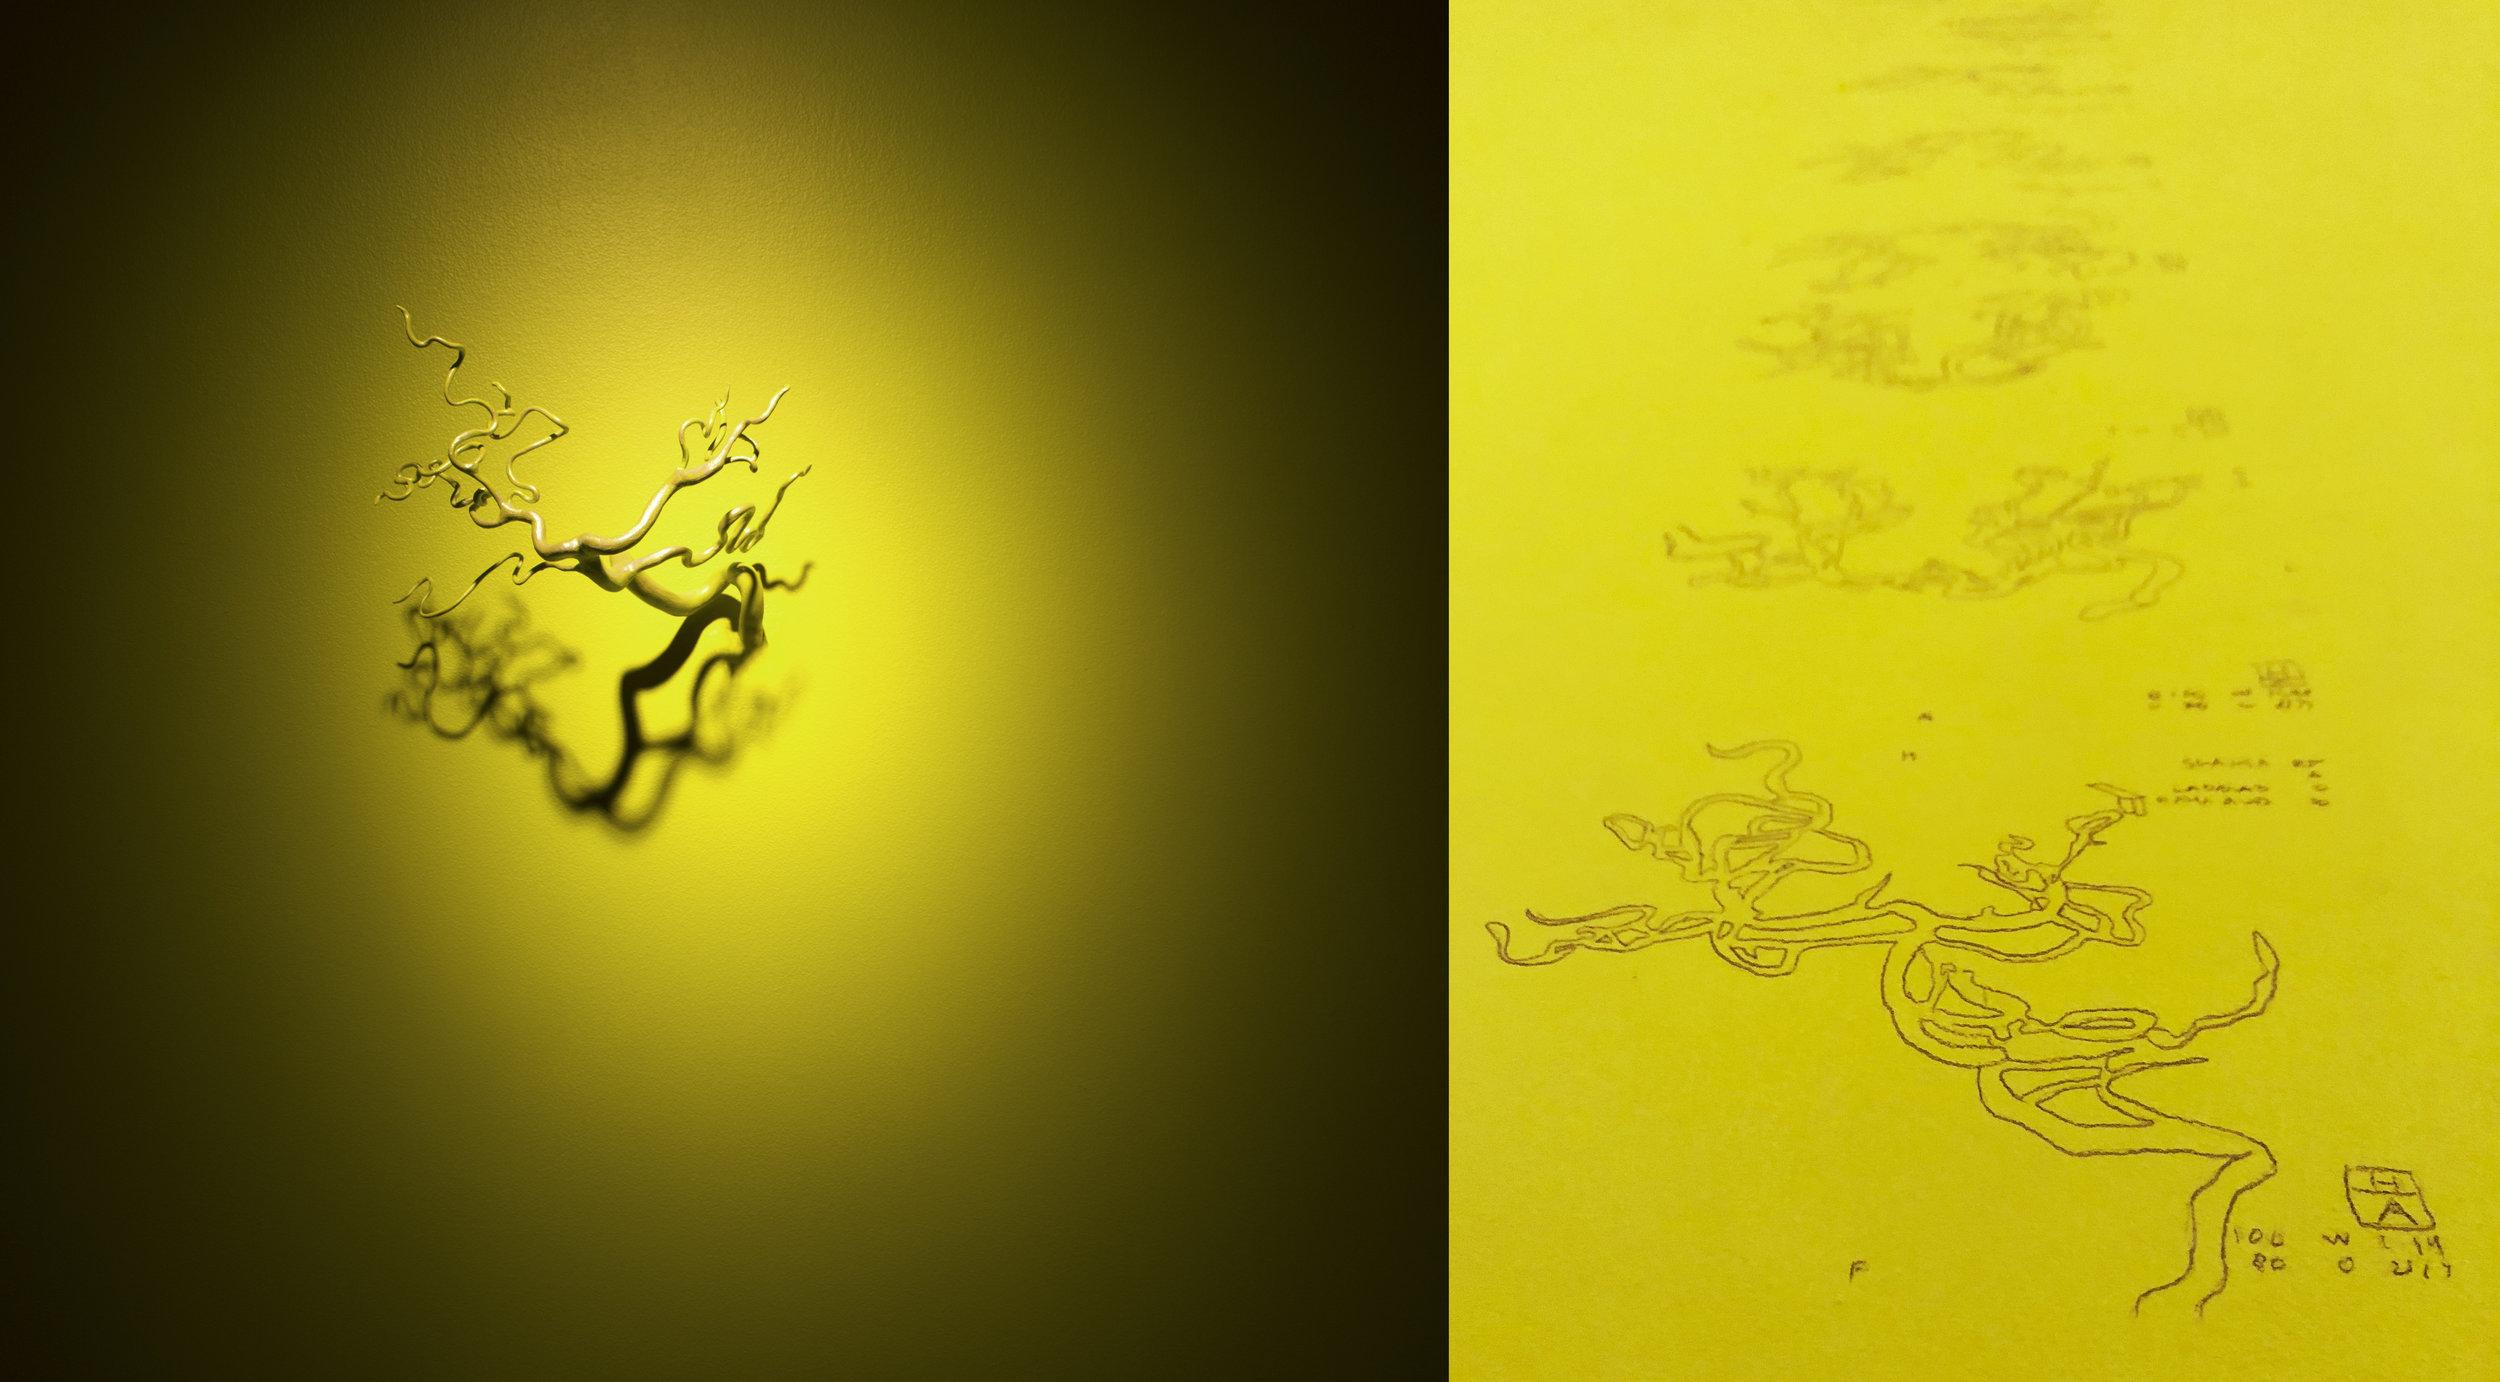 Catatonic Tomography Cycle  (detail). 2018. Resin, paint, iridescent medium, graphite.